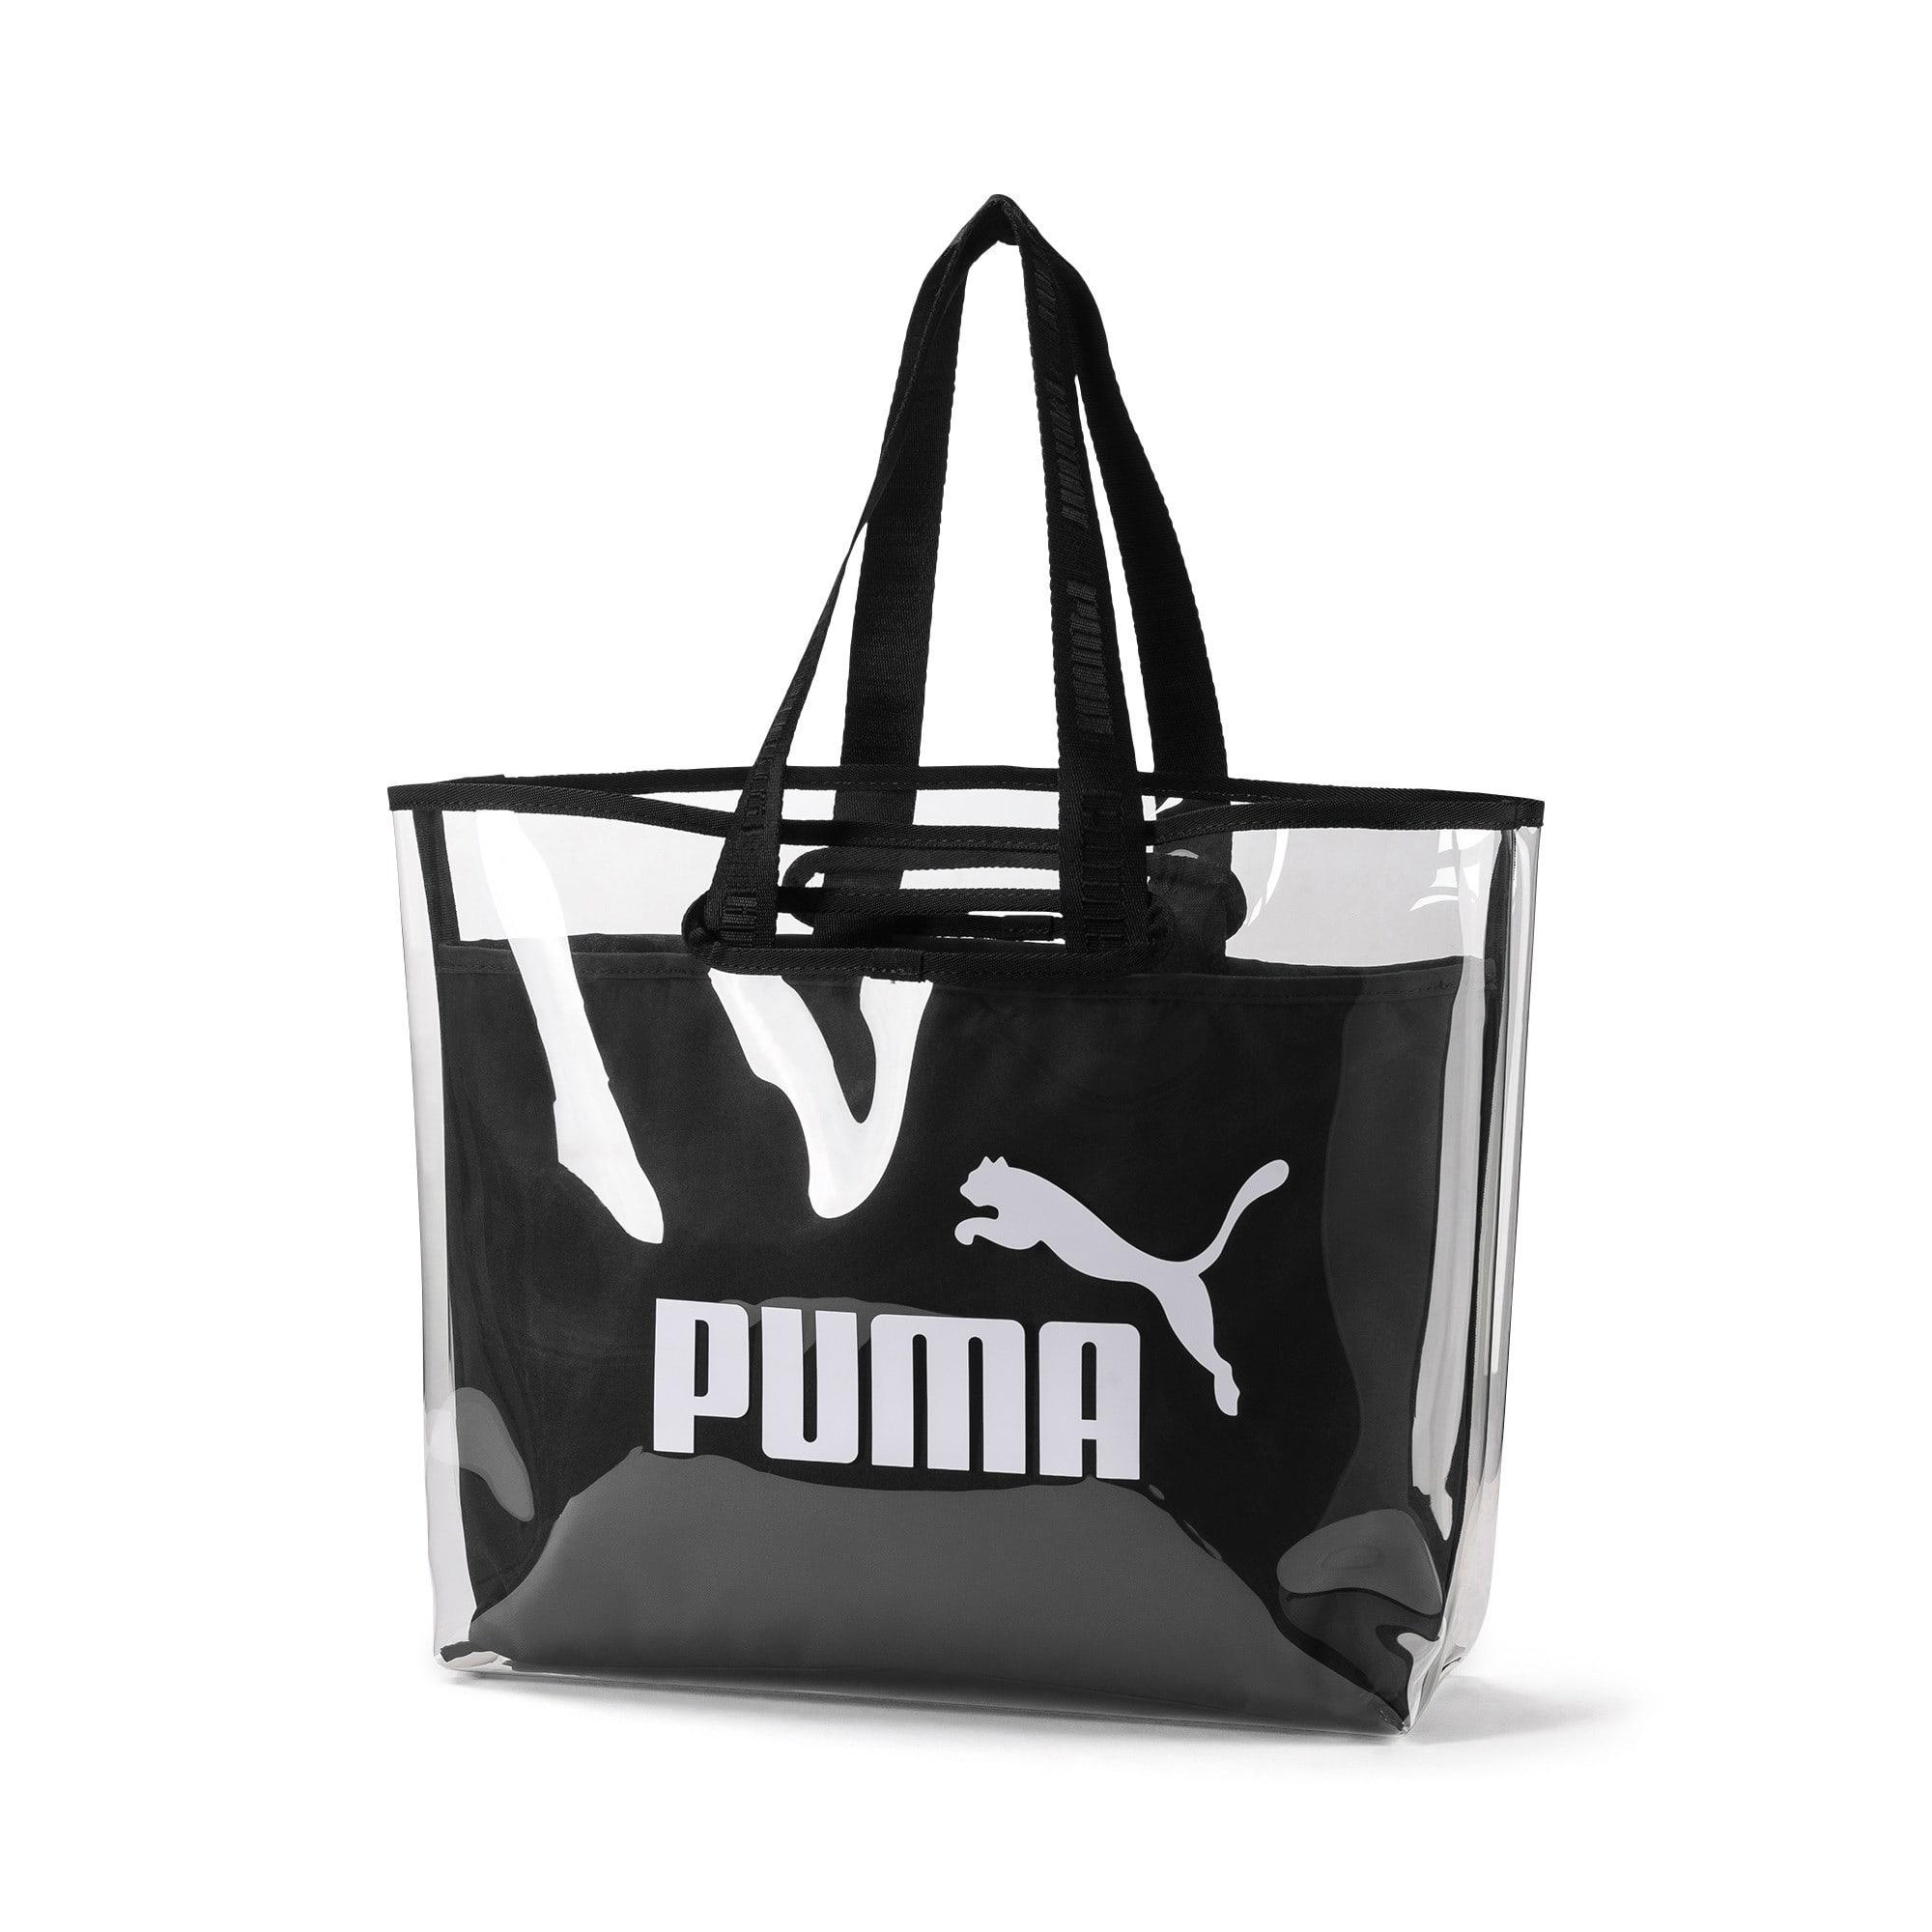 Thumbnail 2 of Women's Twin Shopper, Puma Black, medium